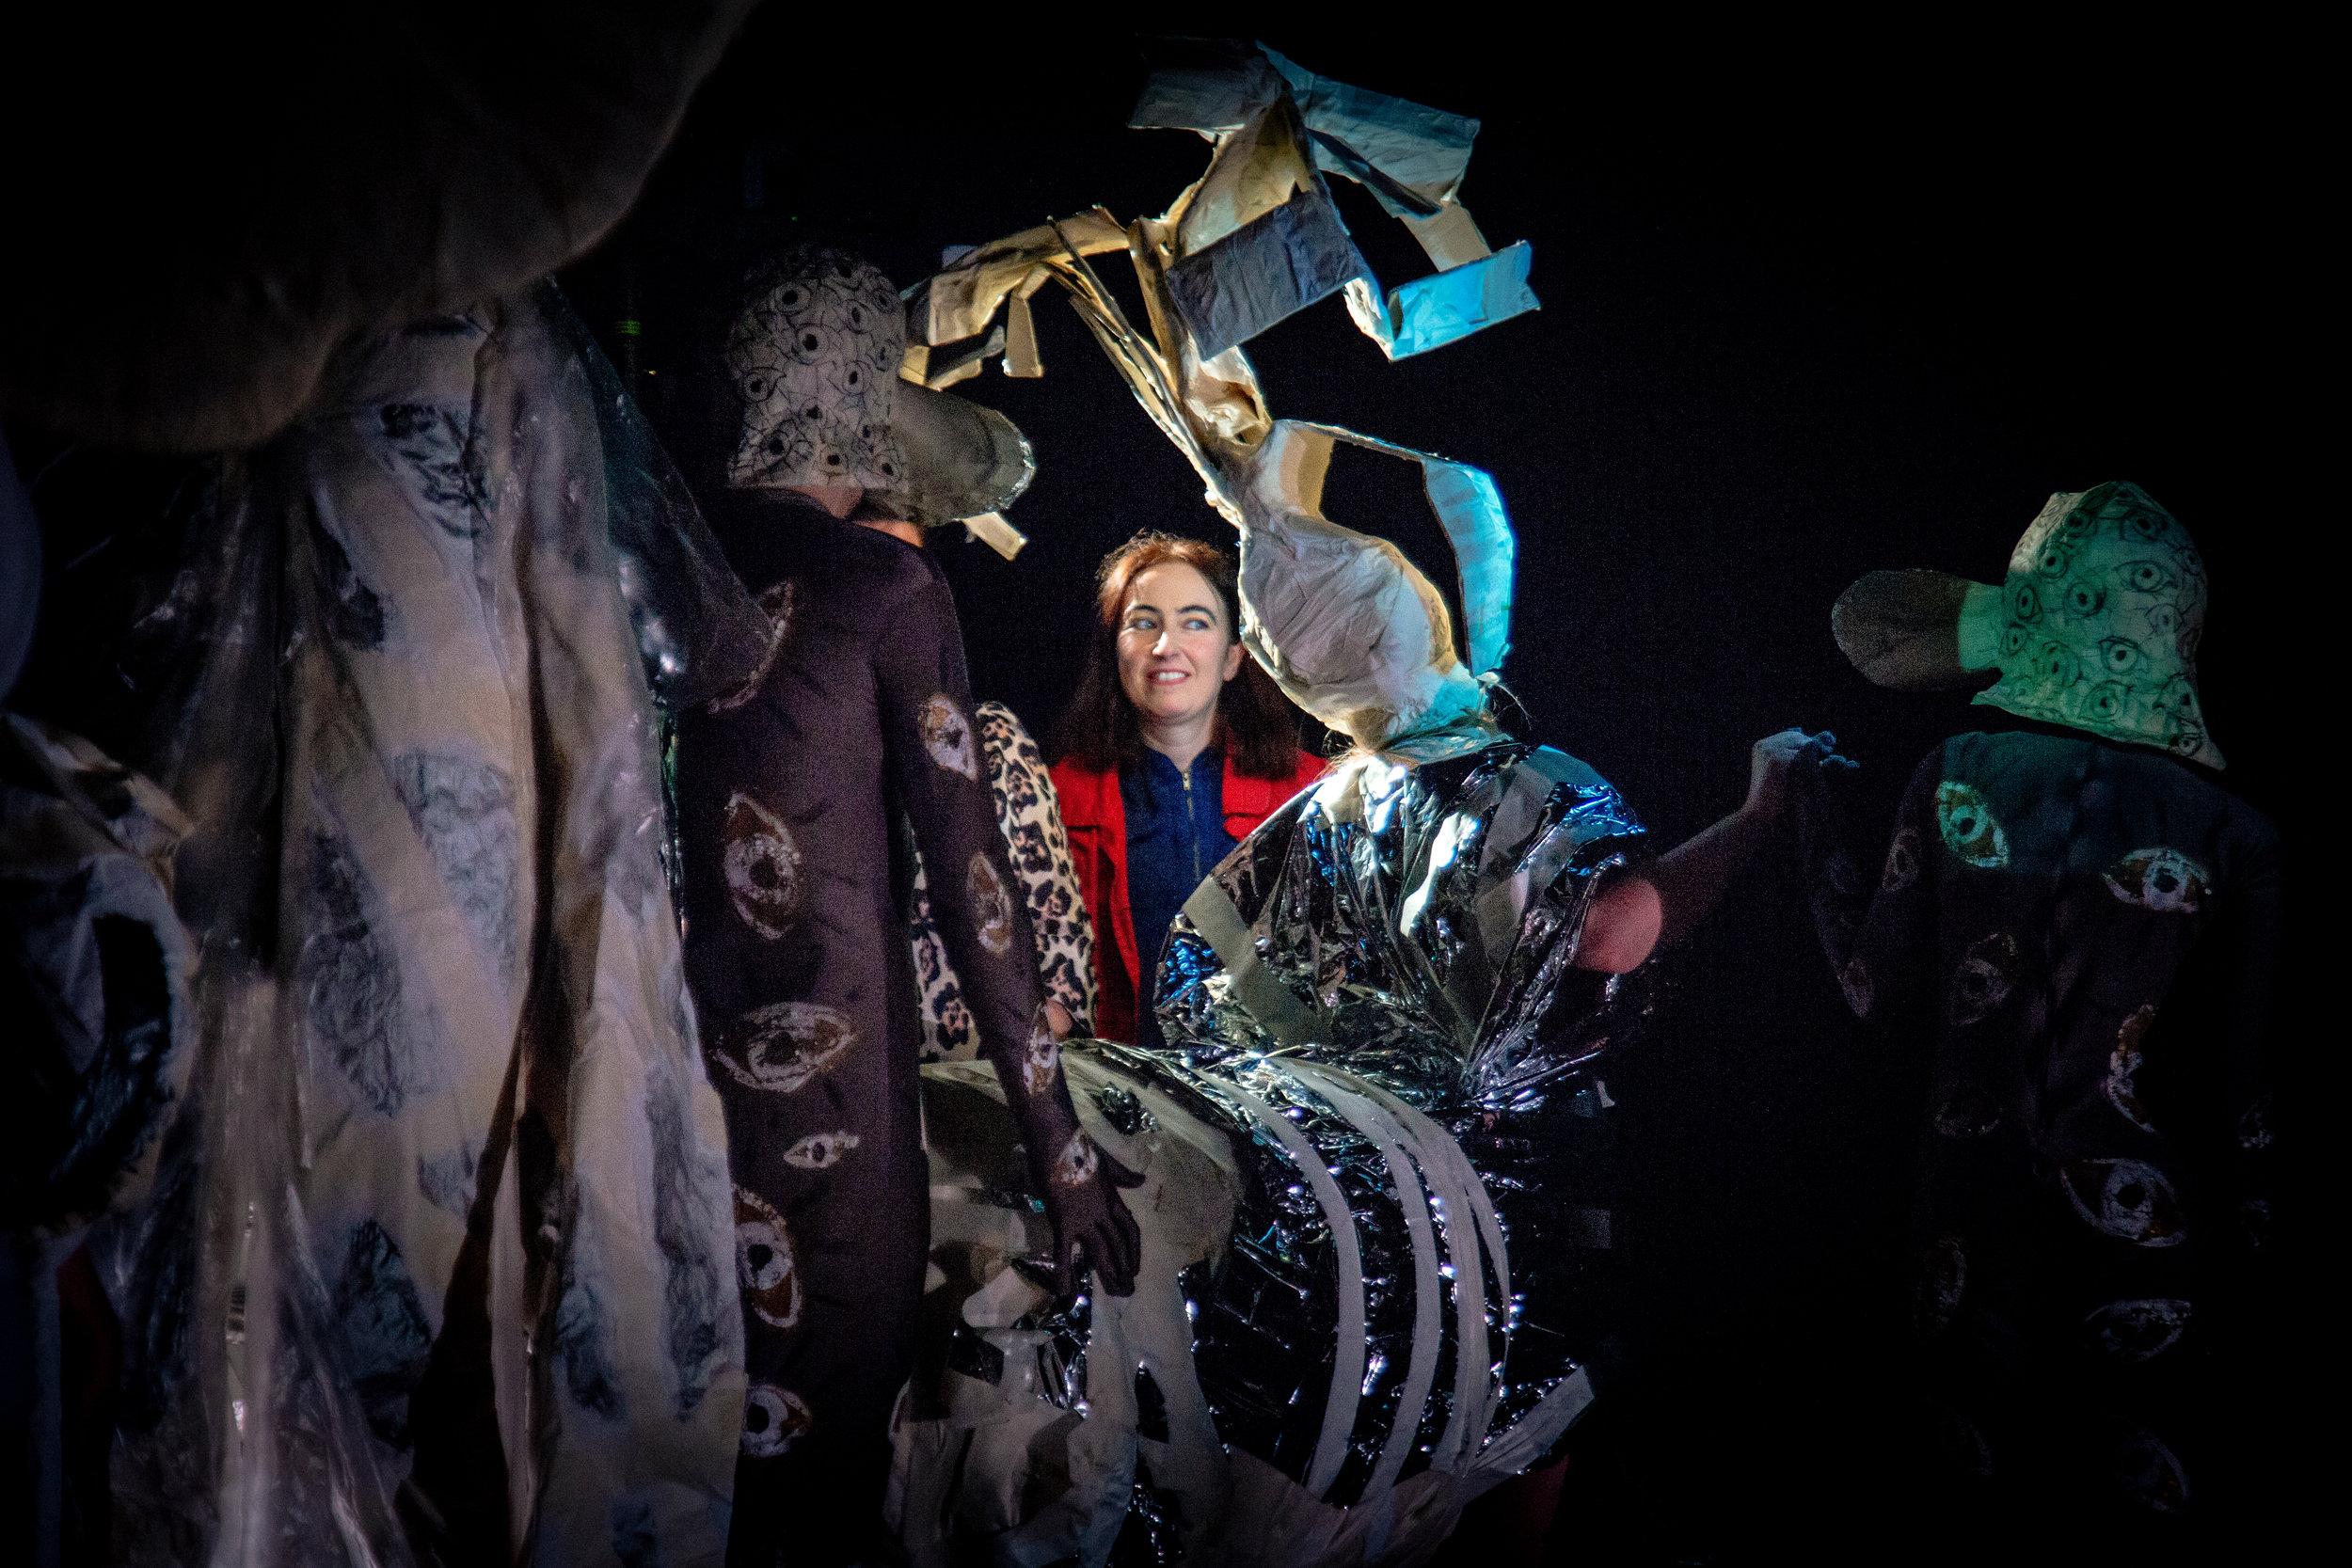 Celina Muldoon, 'Untitled', Live Installation Performance, Live Collision Festival, 2018 (2) (1).jpg